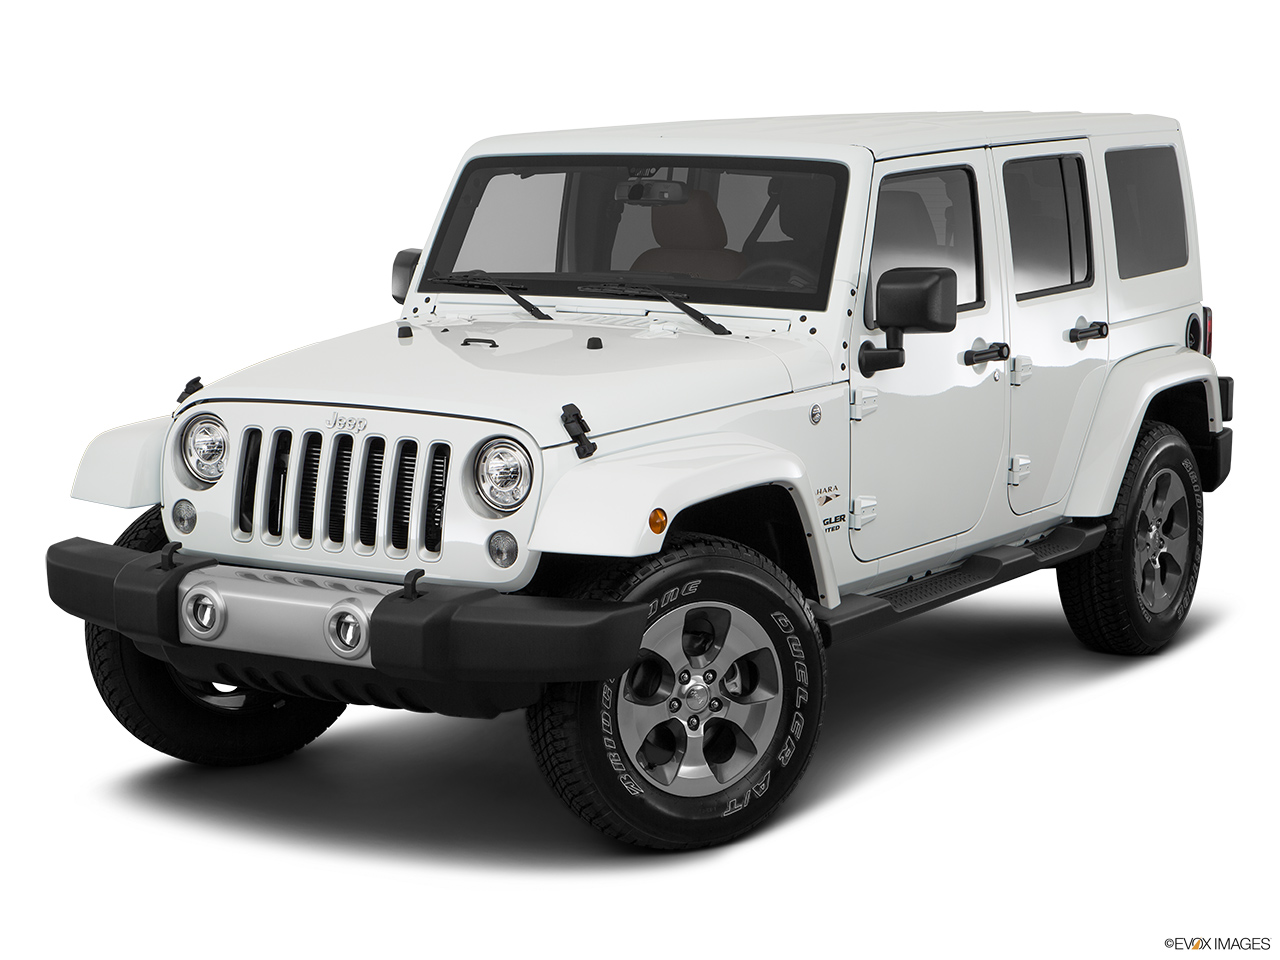 100 sahara jeep interior car design how much is a jeep sahara 2016 jeep wrangler jeep. Black Bedroom Furniture Sets. Home Design Ideas